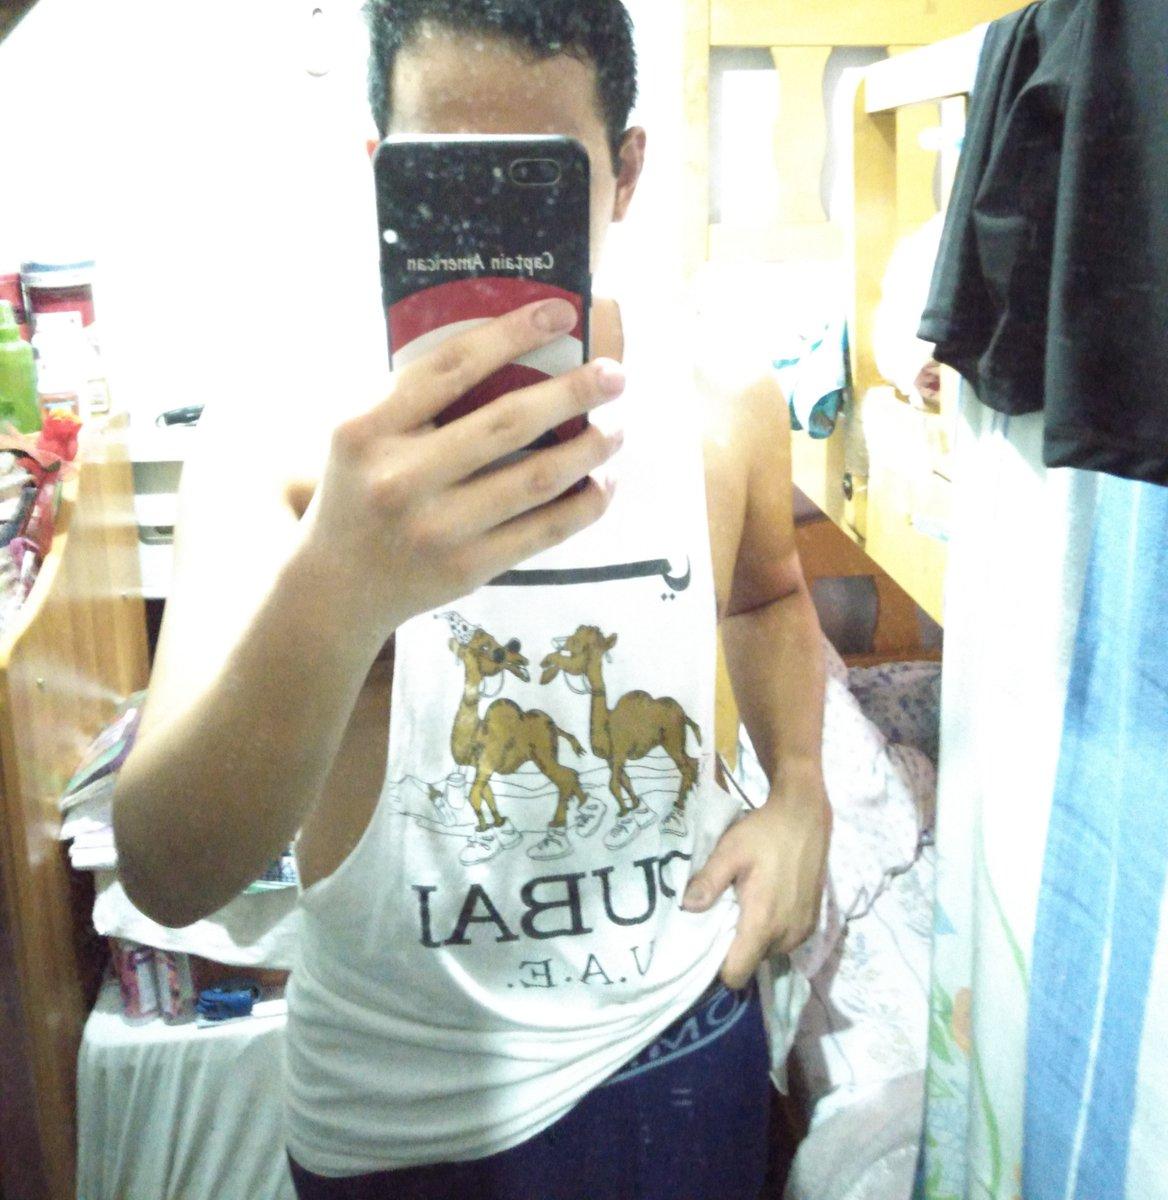 All sweat is out!    #MirrorSelfie #SweatIn #SweatOutpic.twitter.com/XkkntbovXs